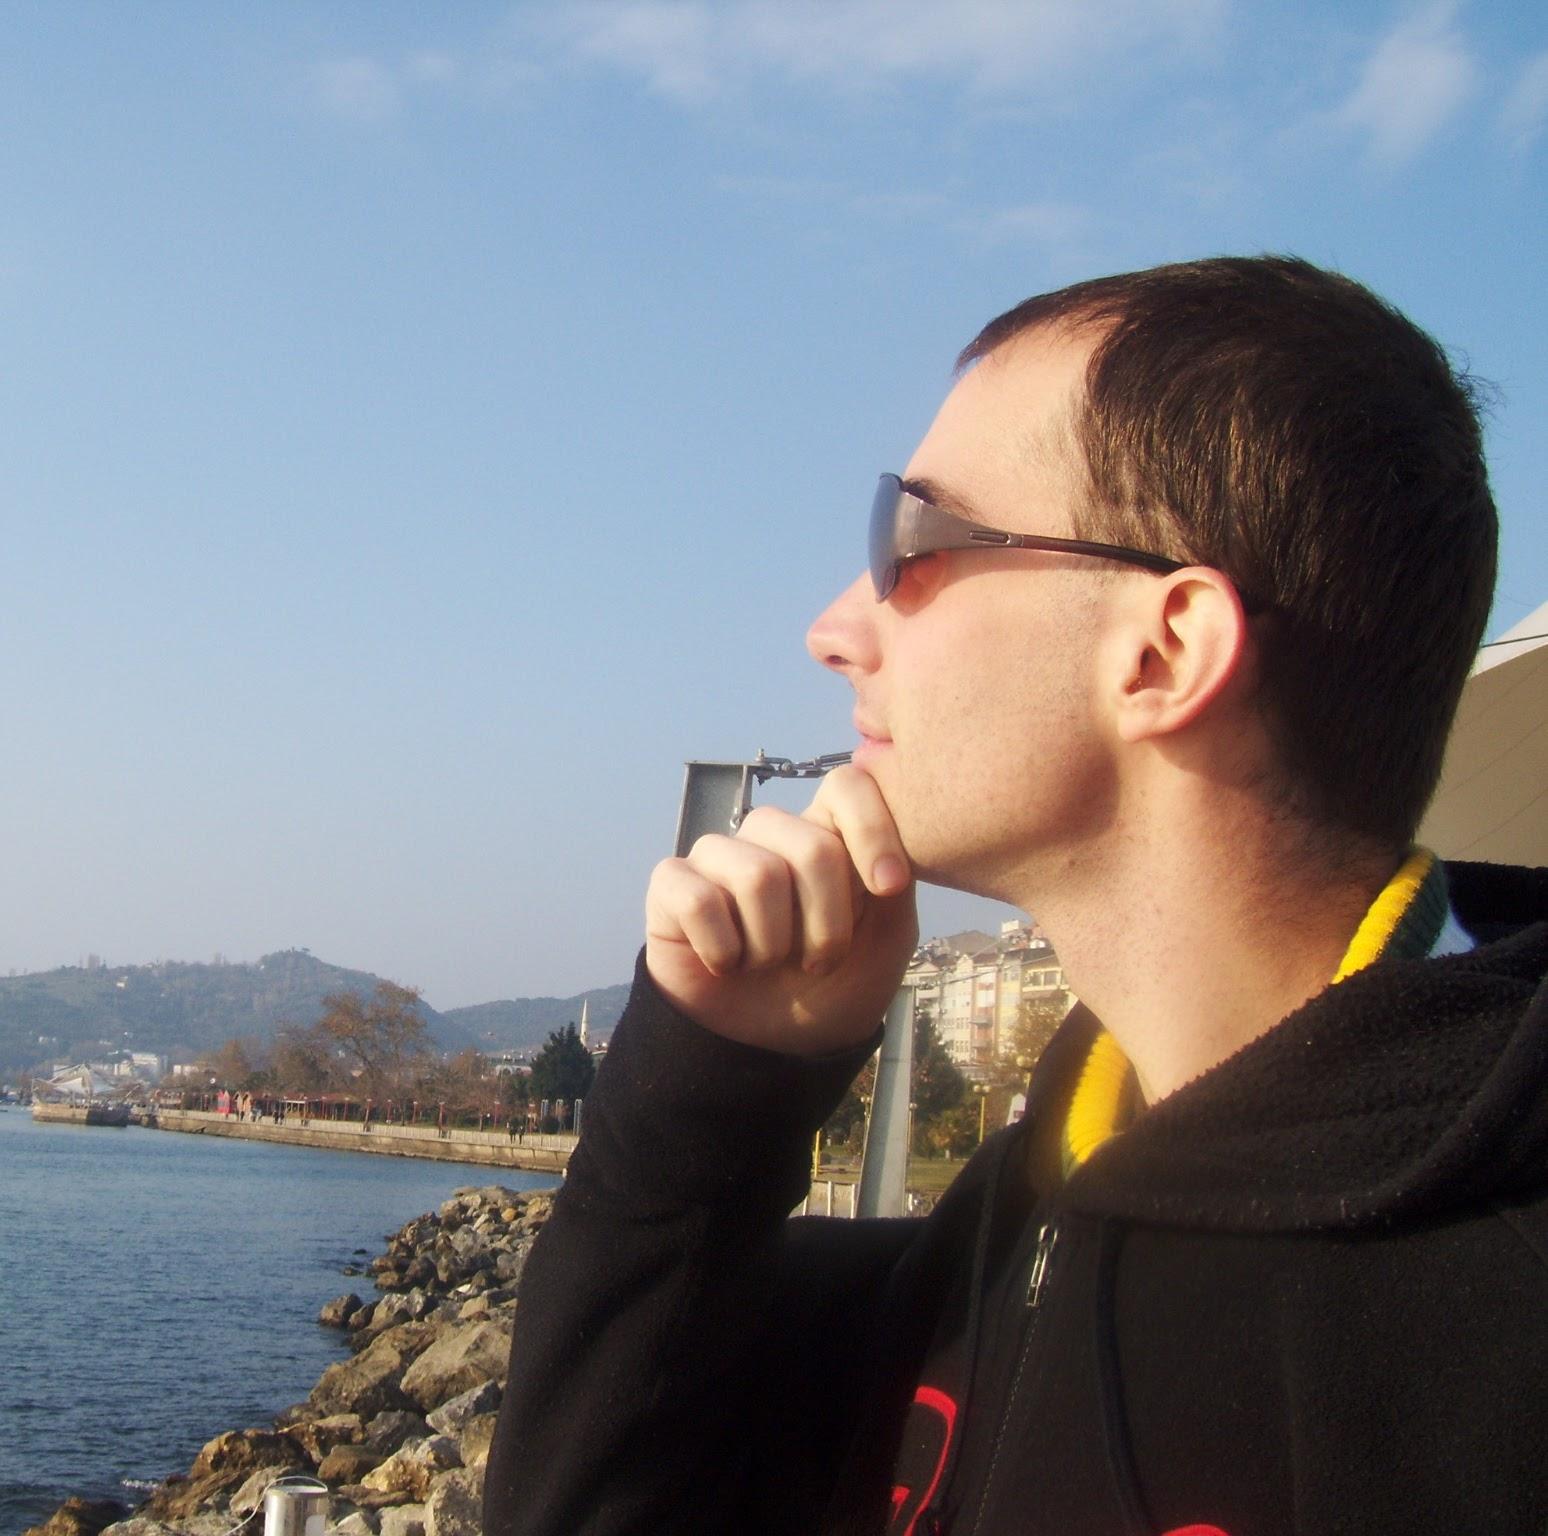 Intervista a Stefano Mini di MindCheats.net